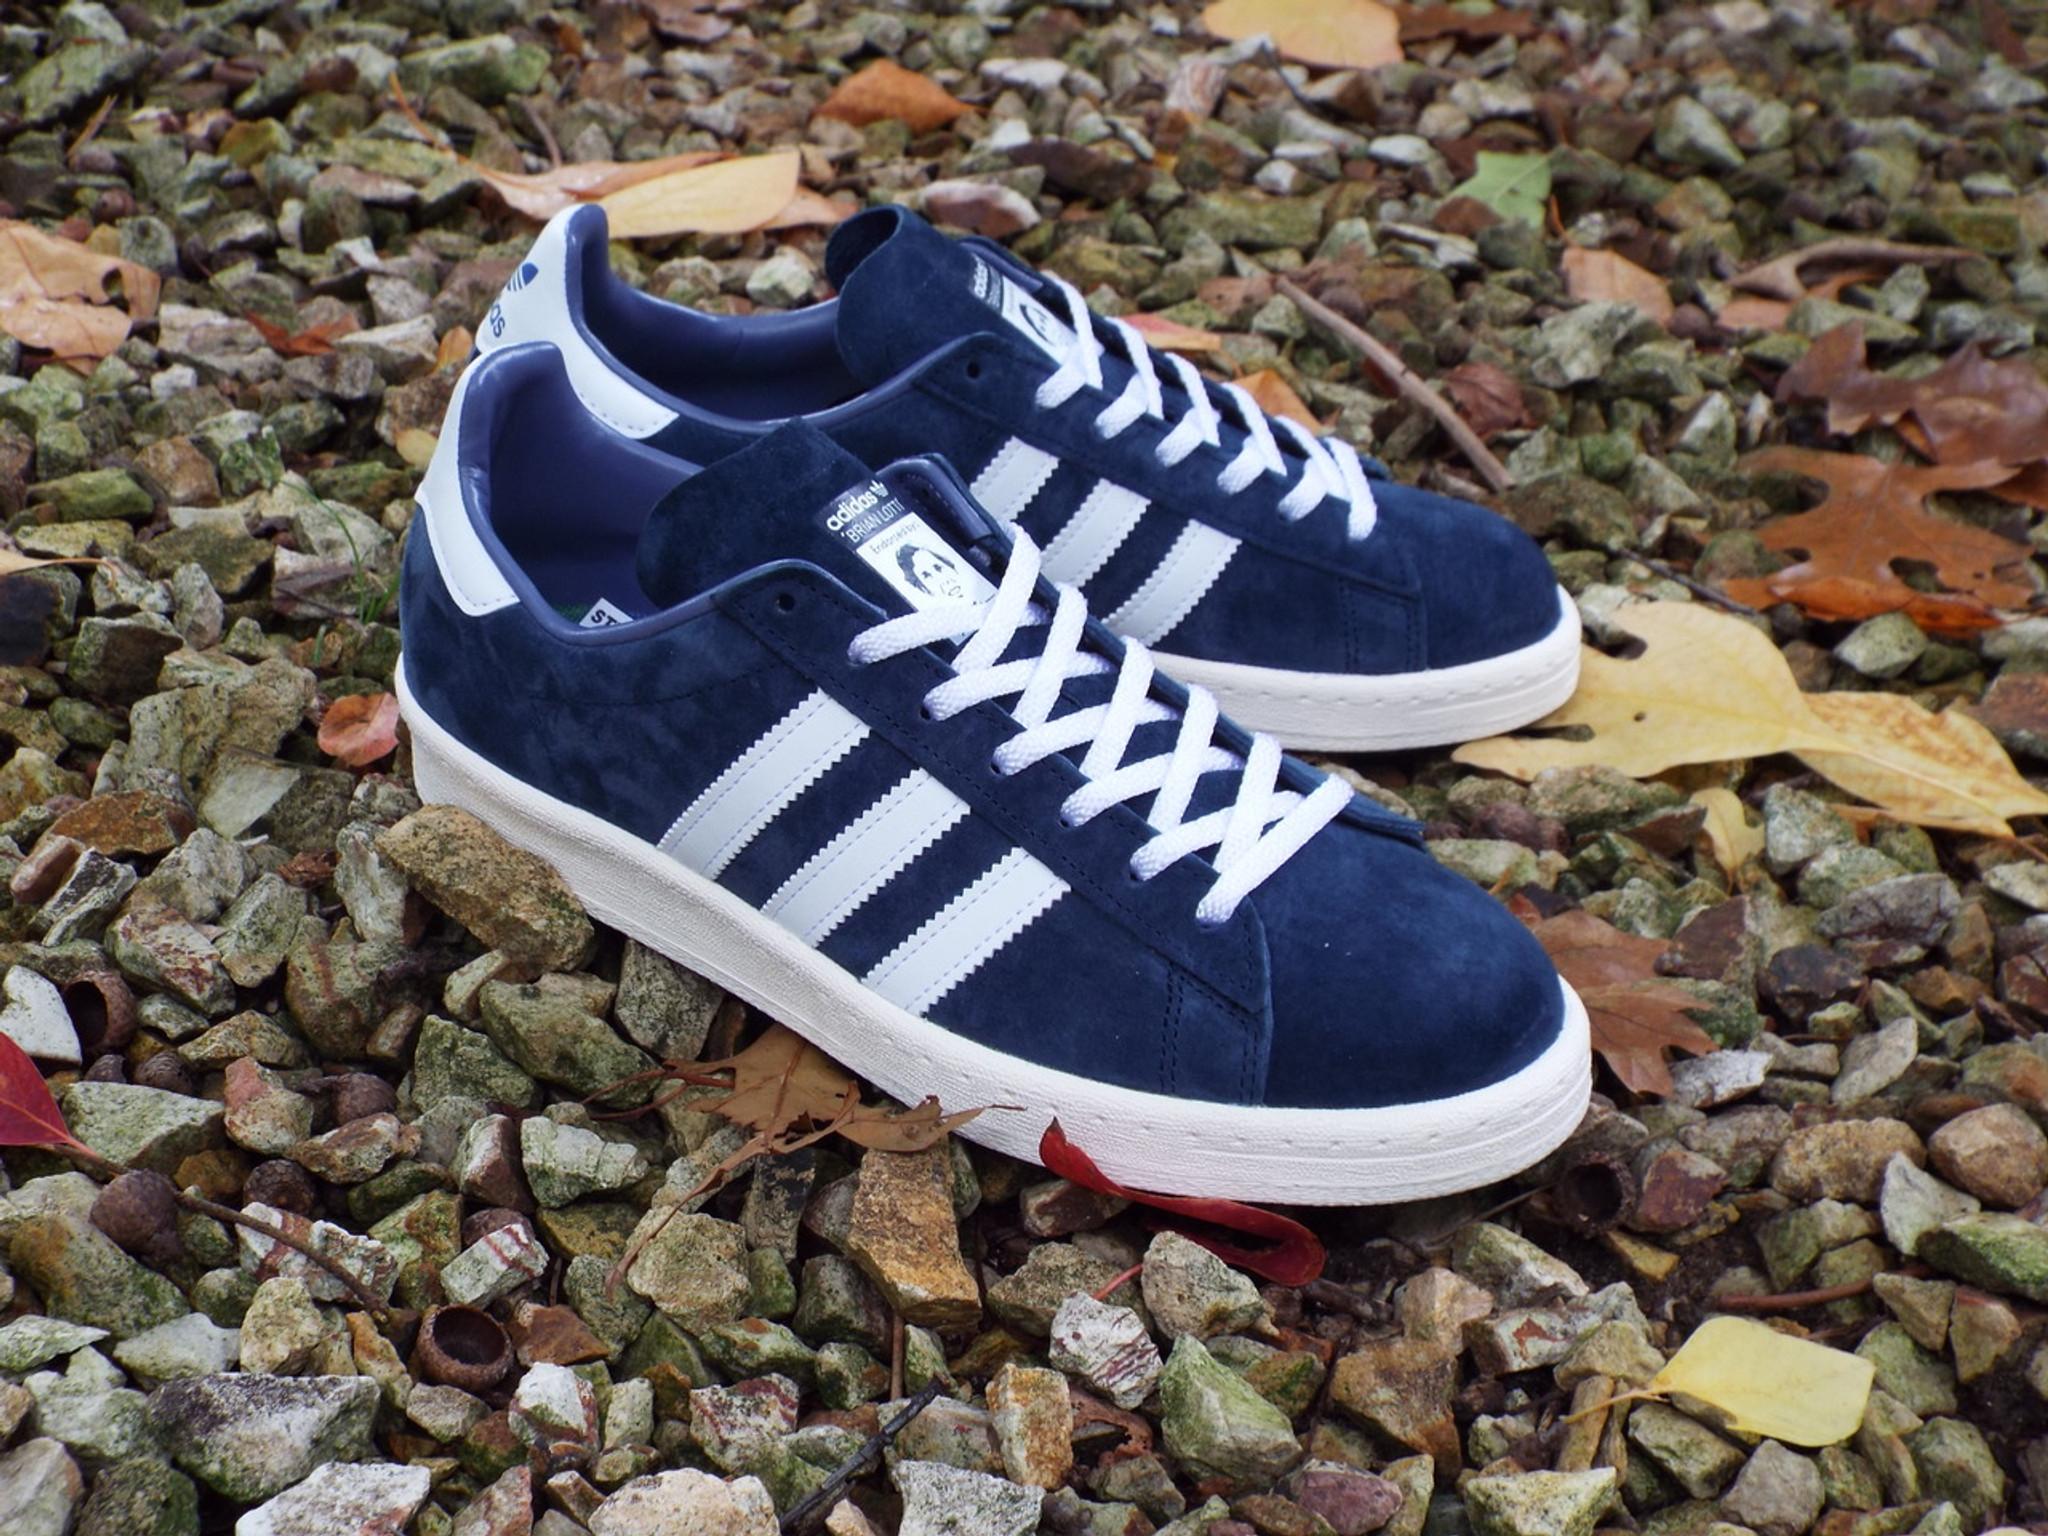 sélection premium 88017 3ab82 Adidas Campus 80s RYR (Brian Lotti) Shoes - Collegiate Navy/White